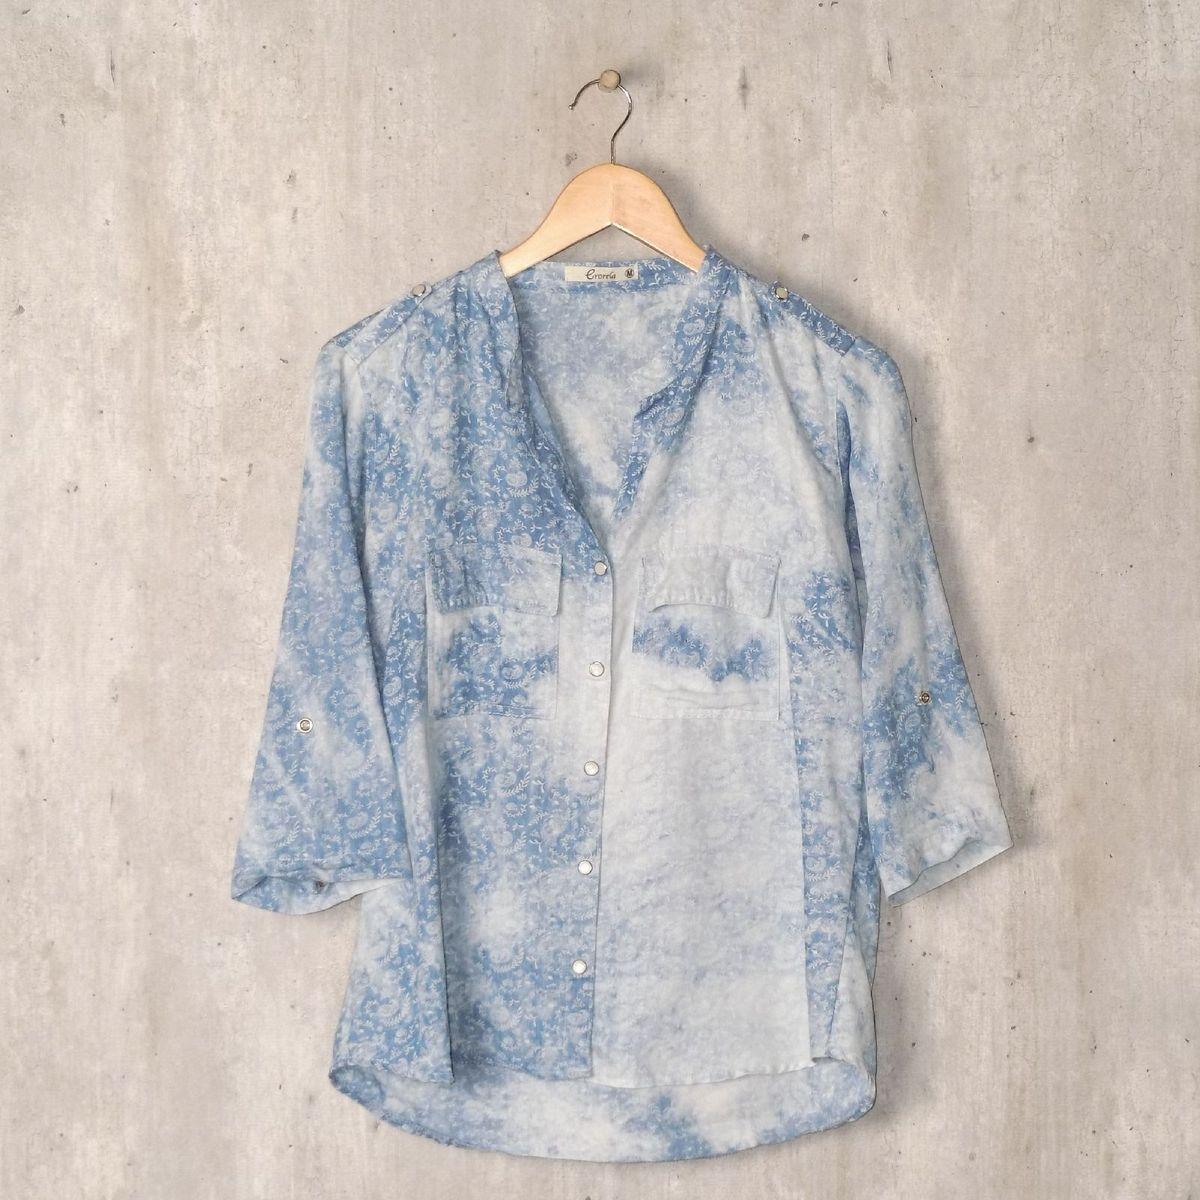 camisa azul paisely crorela - camisas crorela